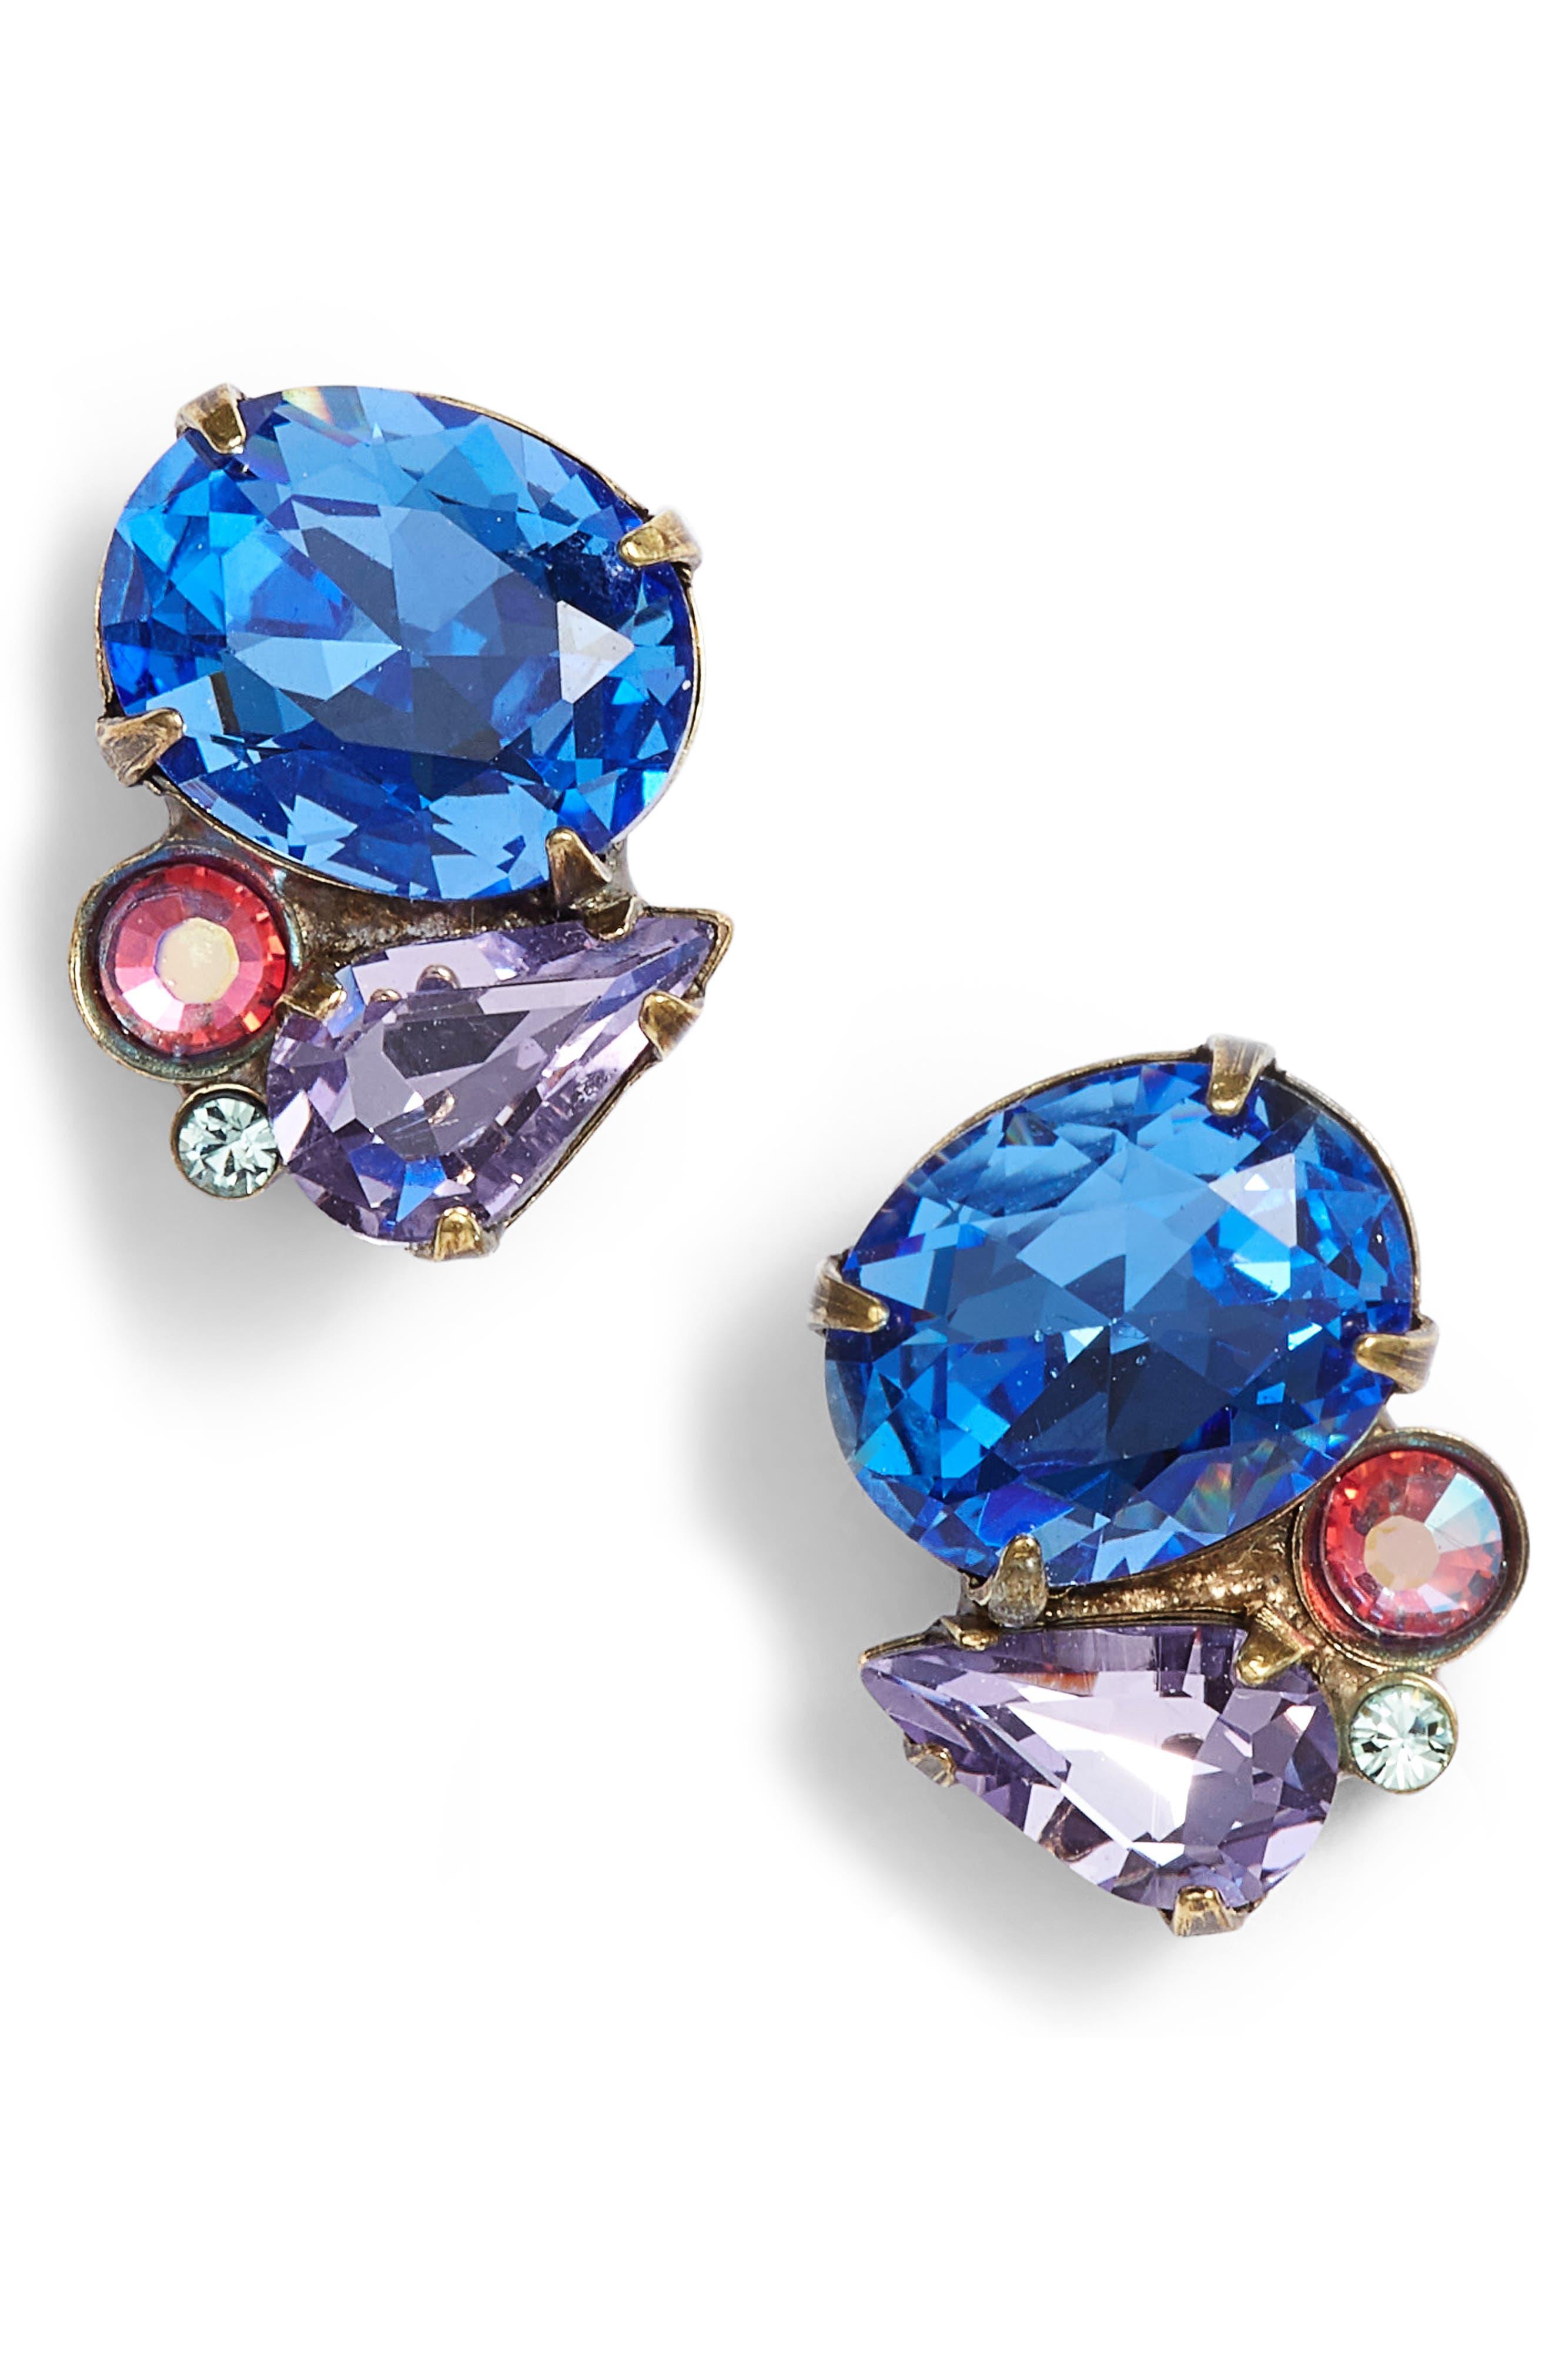 Mayflower Crystal Earrings,                         Main,                         color, BLUE